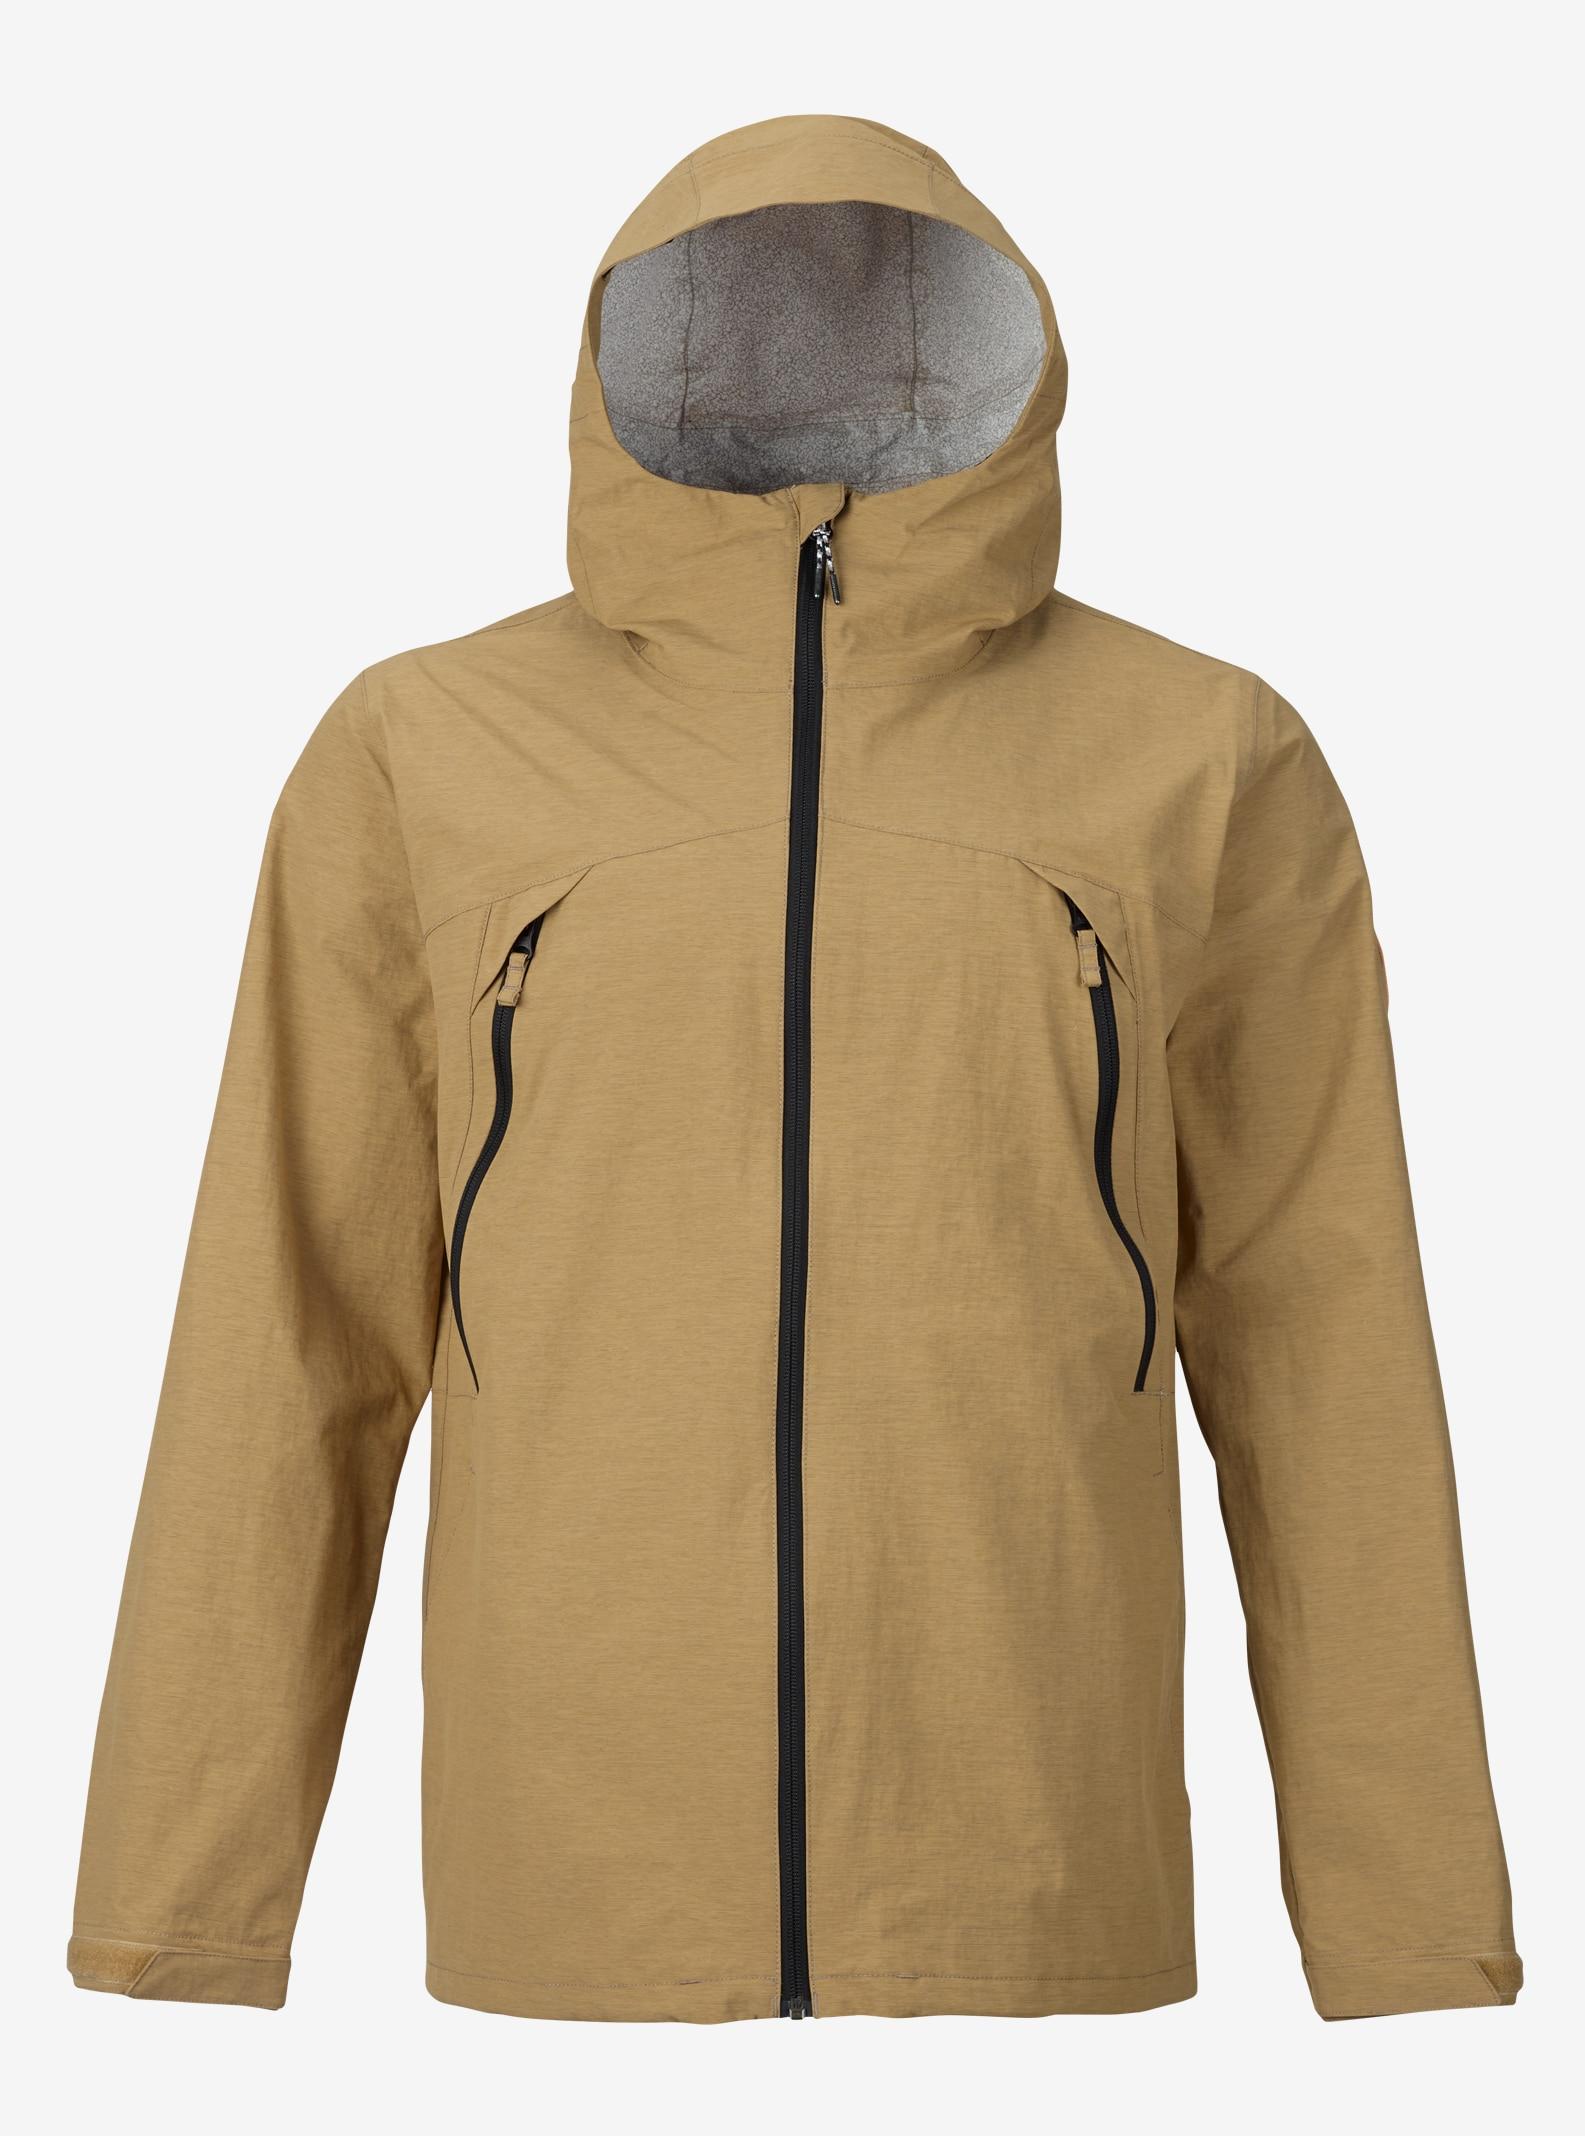 Burton Intervale Rain Jacket shown in Kelp